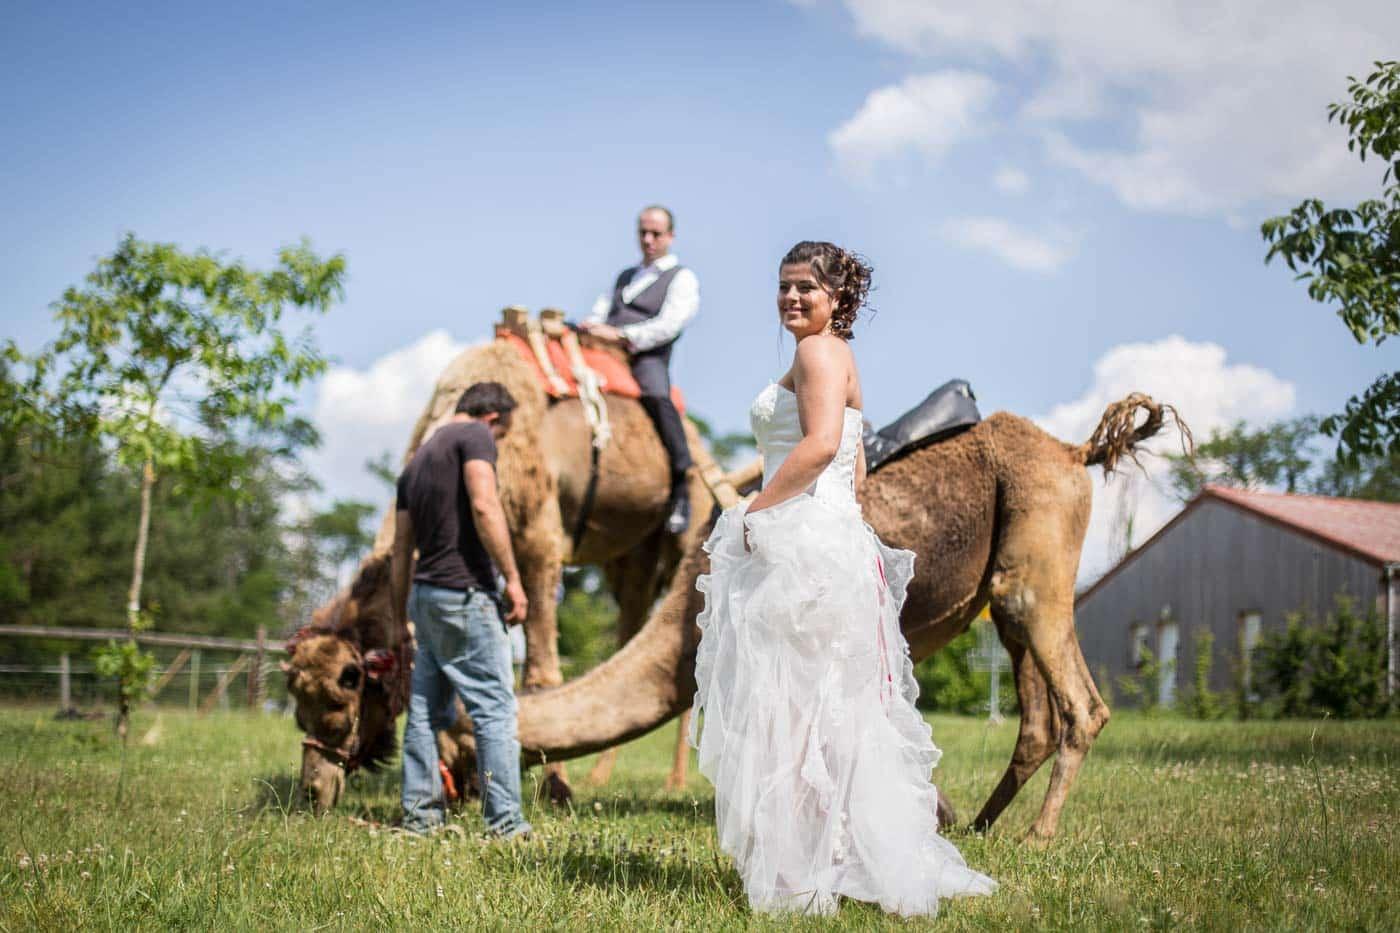 raphai-bernus-photos-de-mariage-2